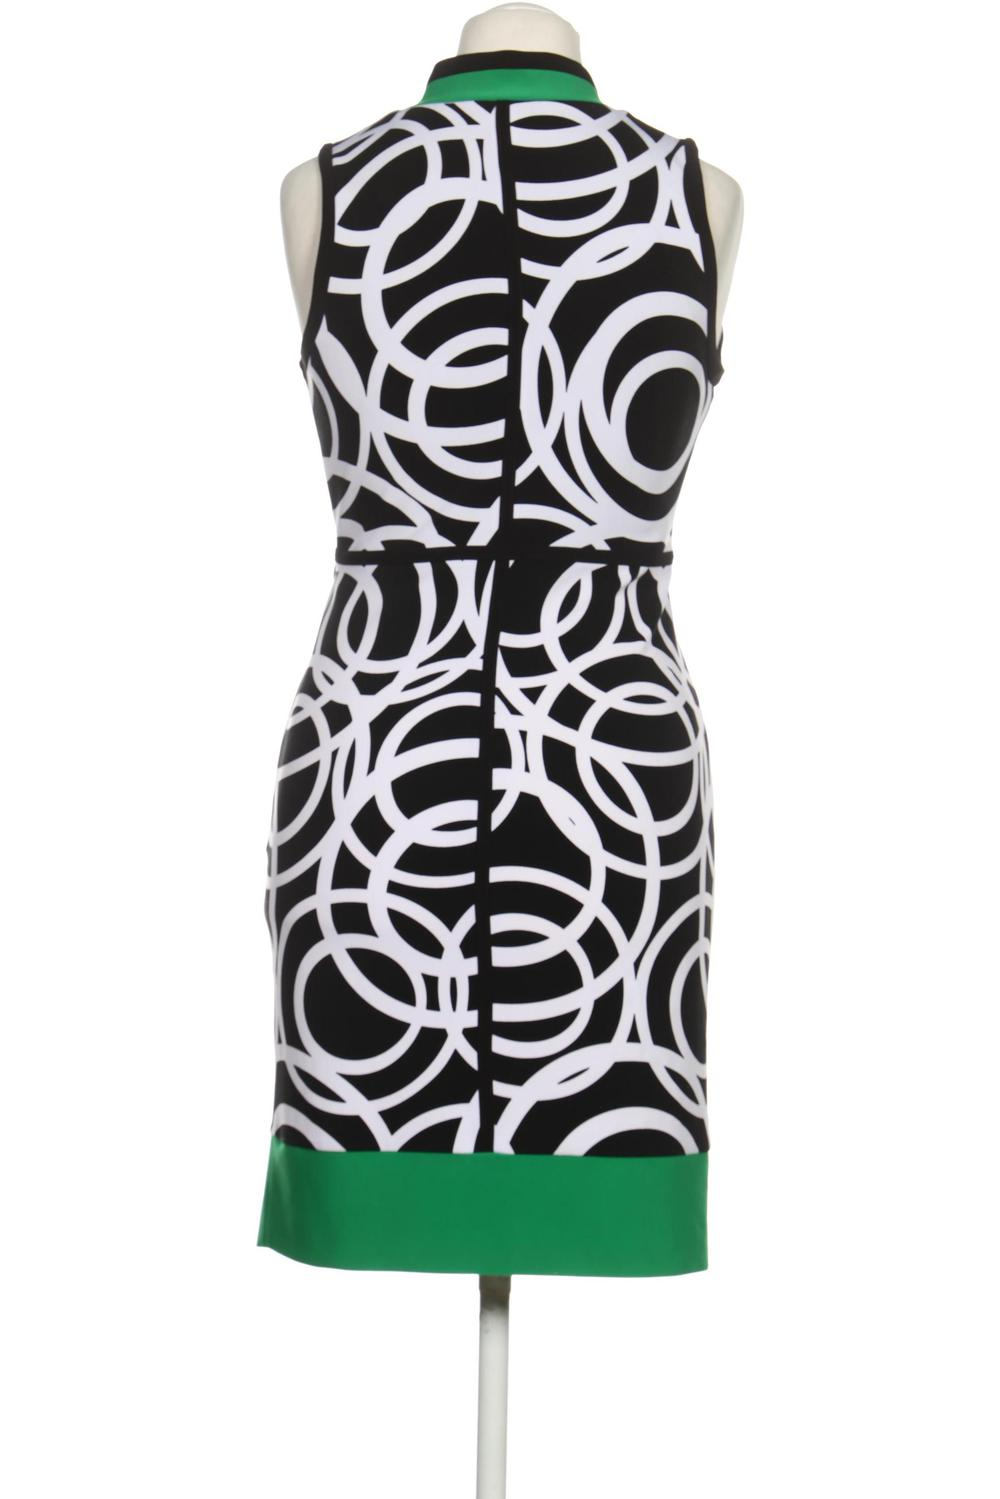 Joseph Ribkoff Damen Kleid DE 36 Second Hand kaufen | ubup